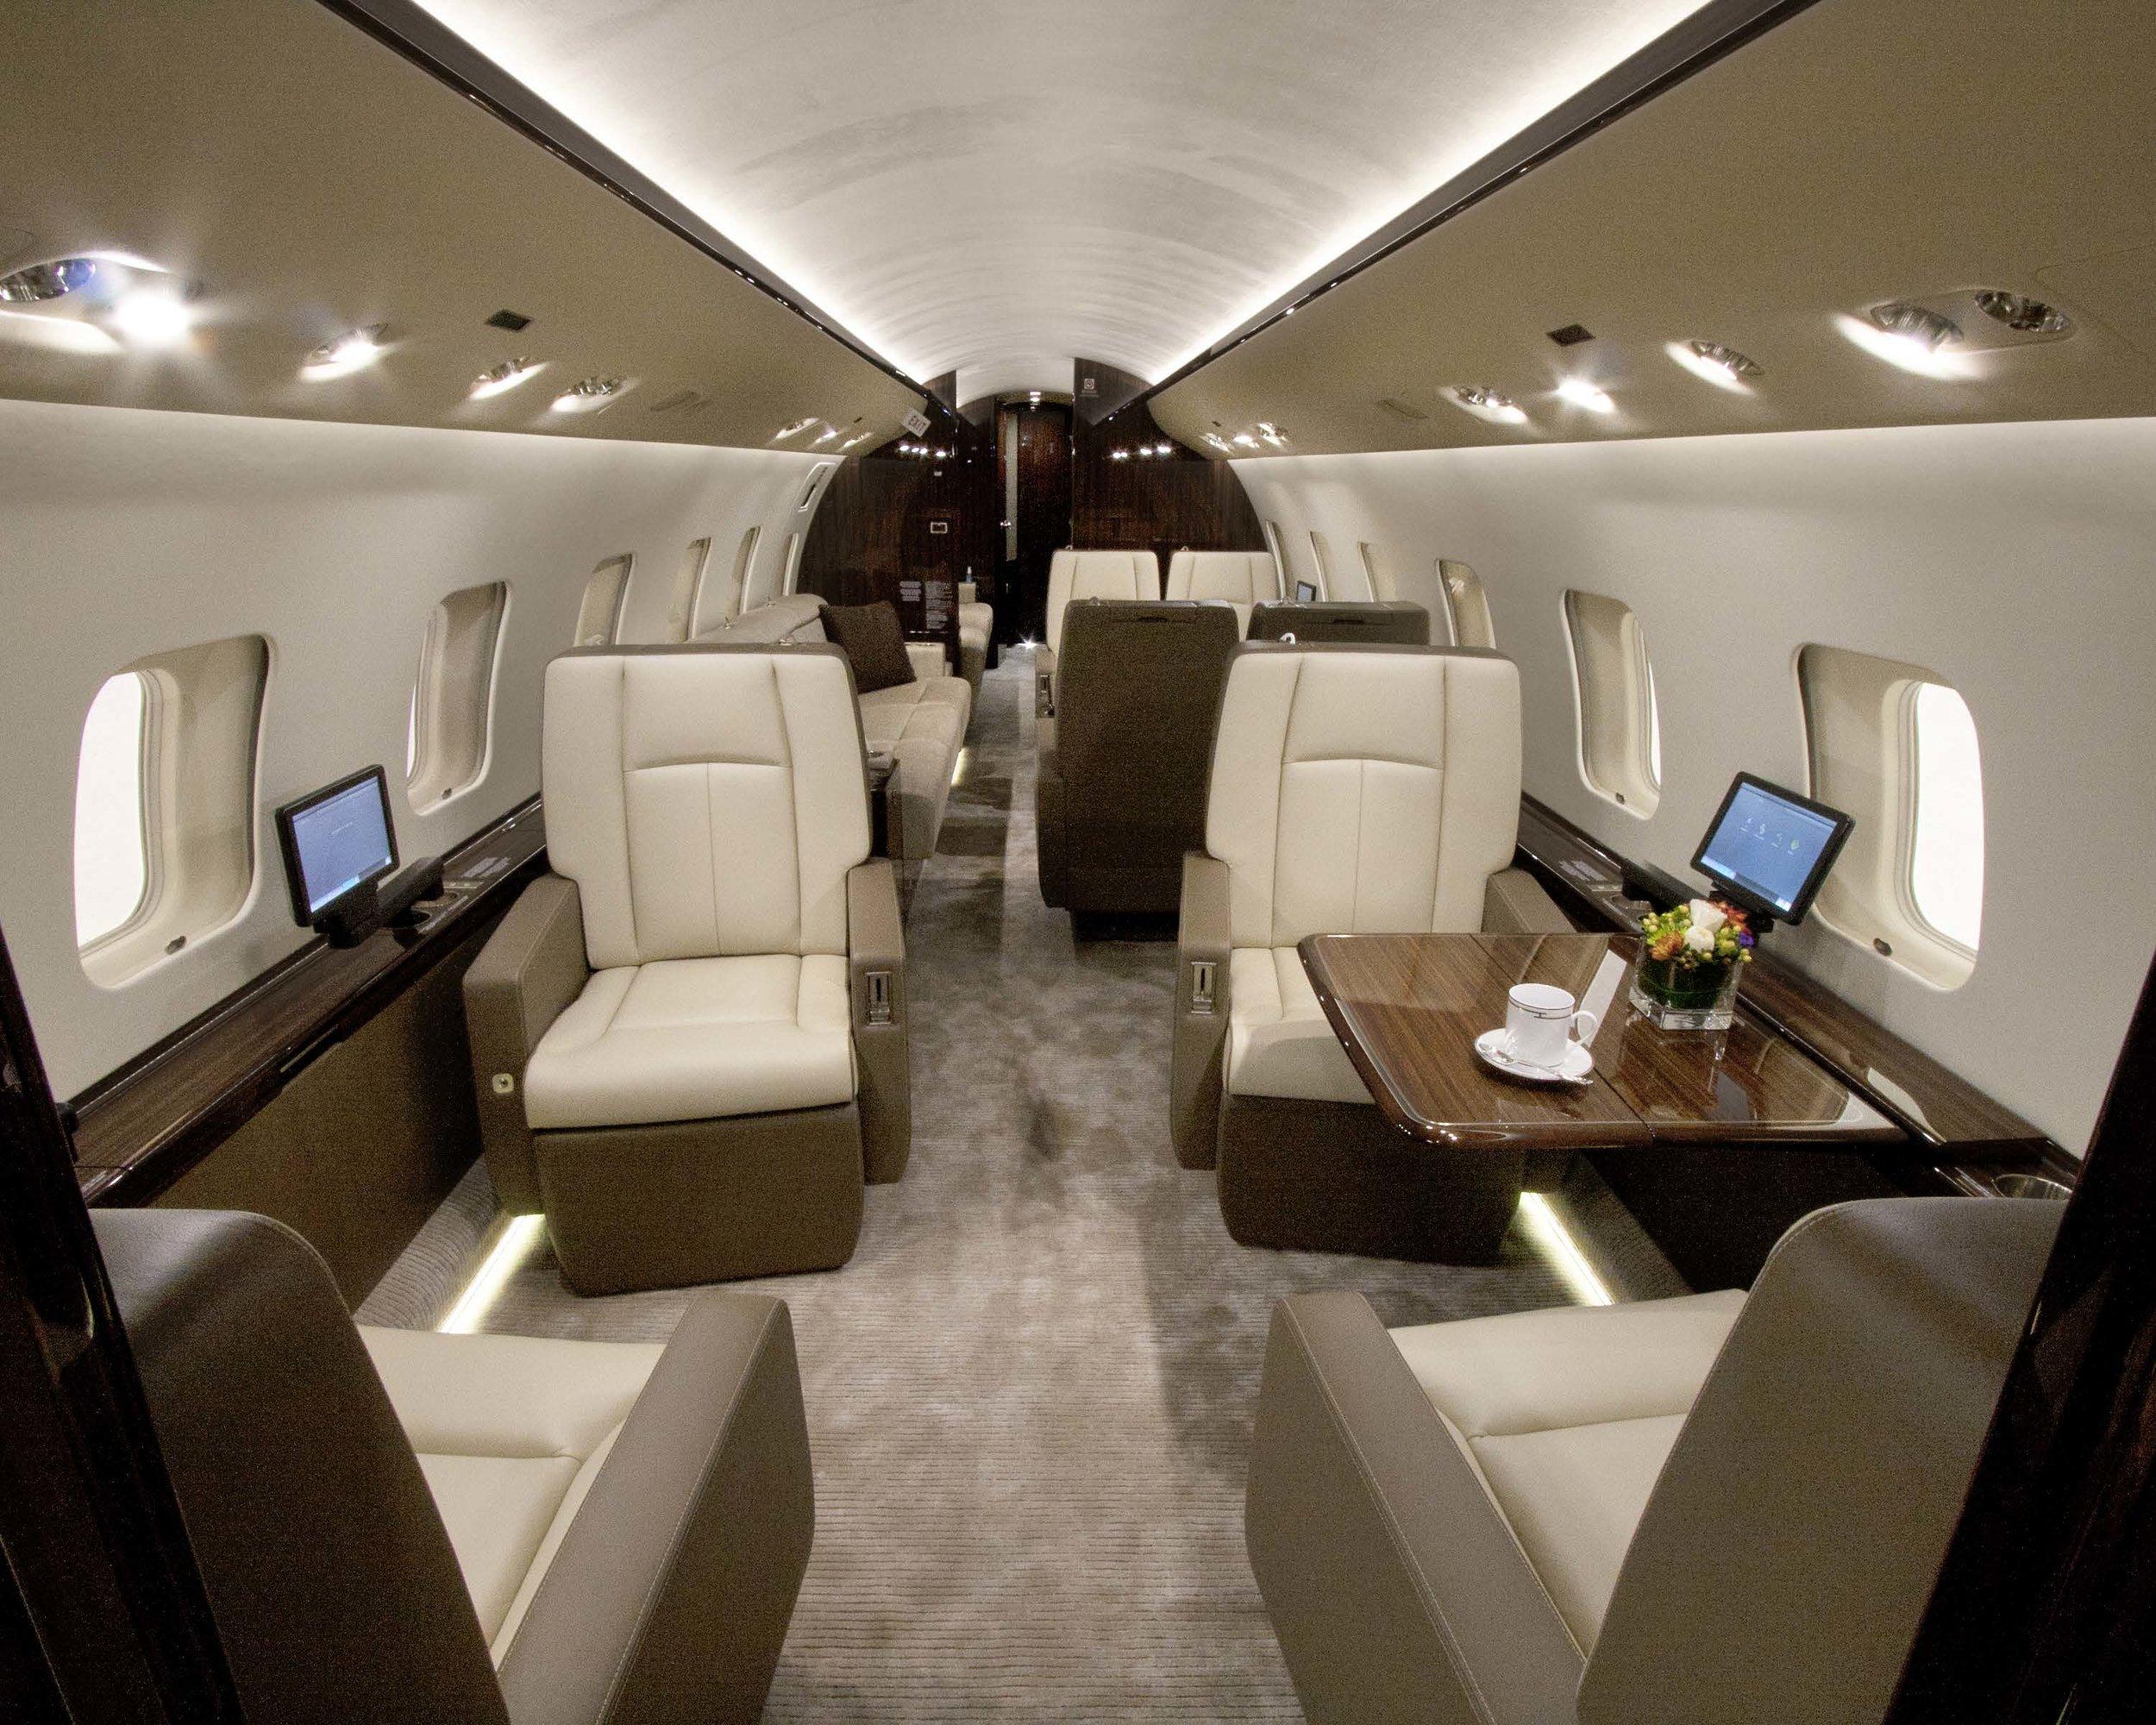 Global 6000 interior.jpg